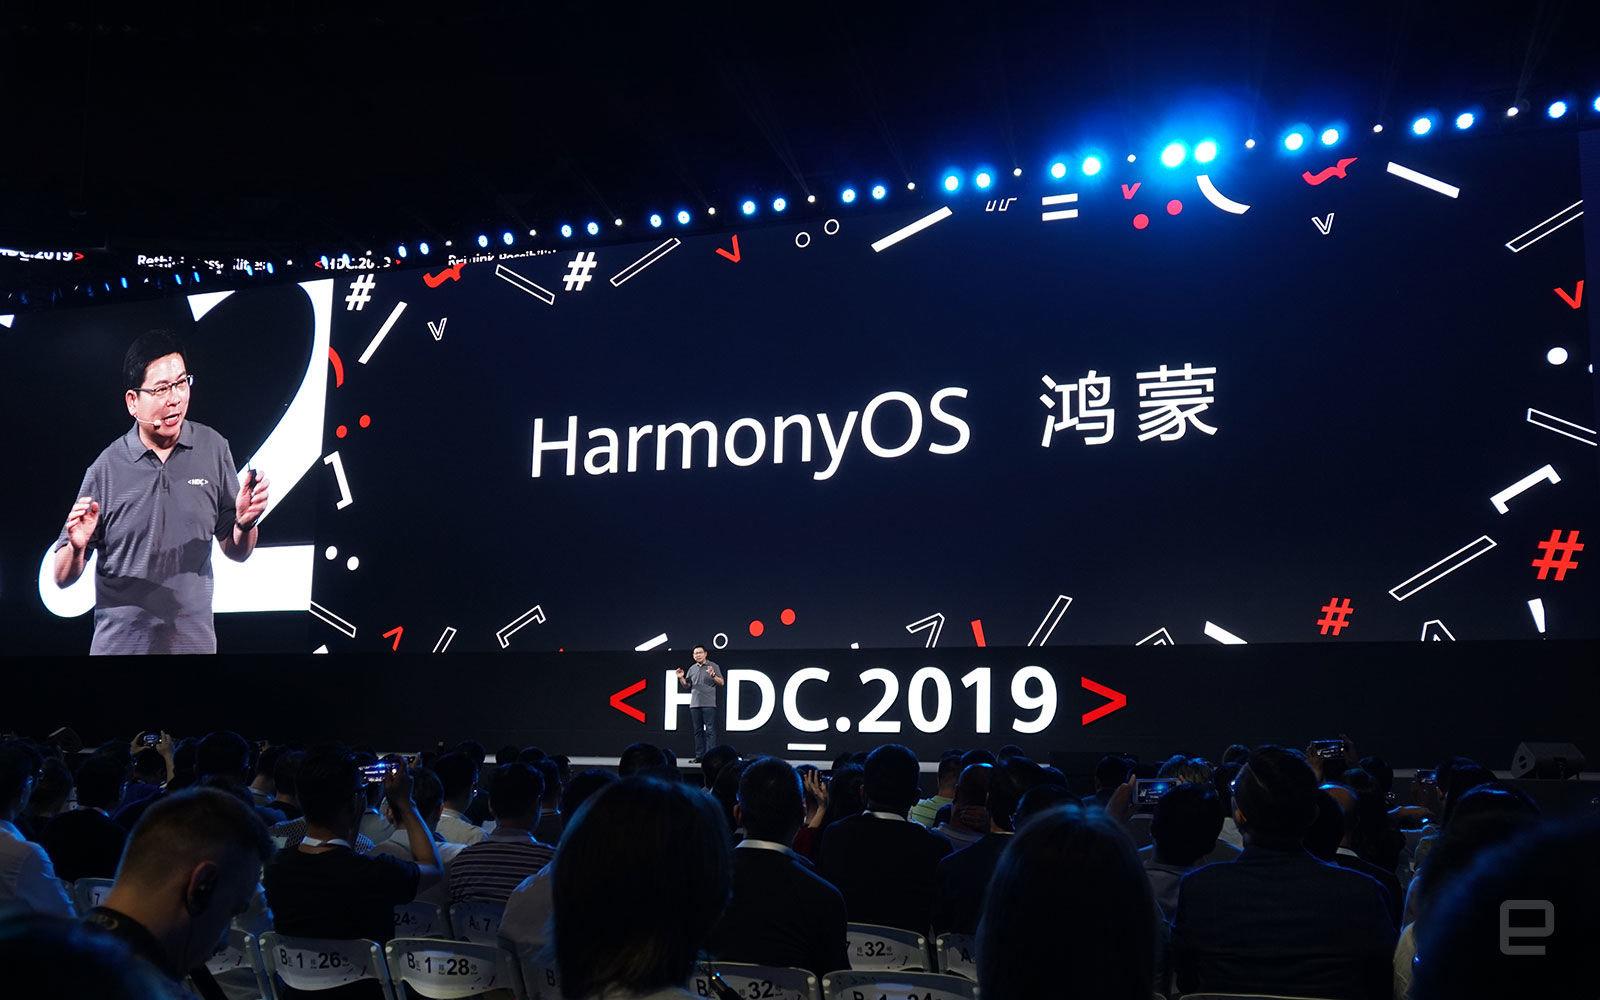 huawei os huawei Saingi Android dan IOS, Huawei Luncurkan Harmony OS harmony os